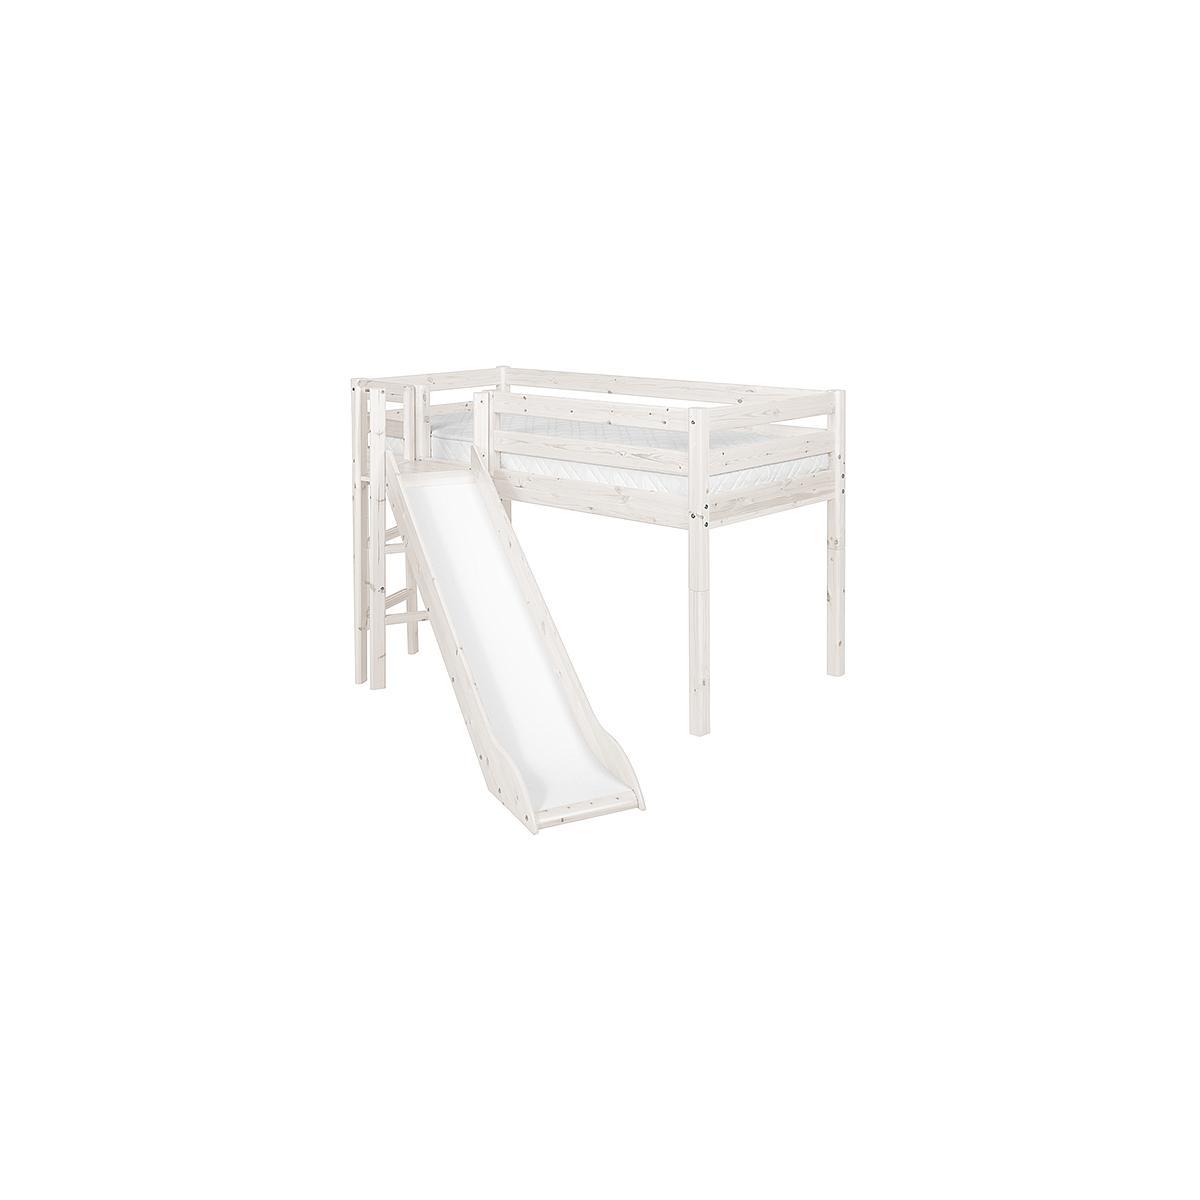 Plataforma y patas Cama media alta CLASSIC Flexa blanco cal